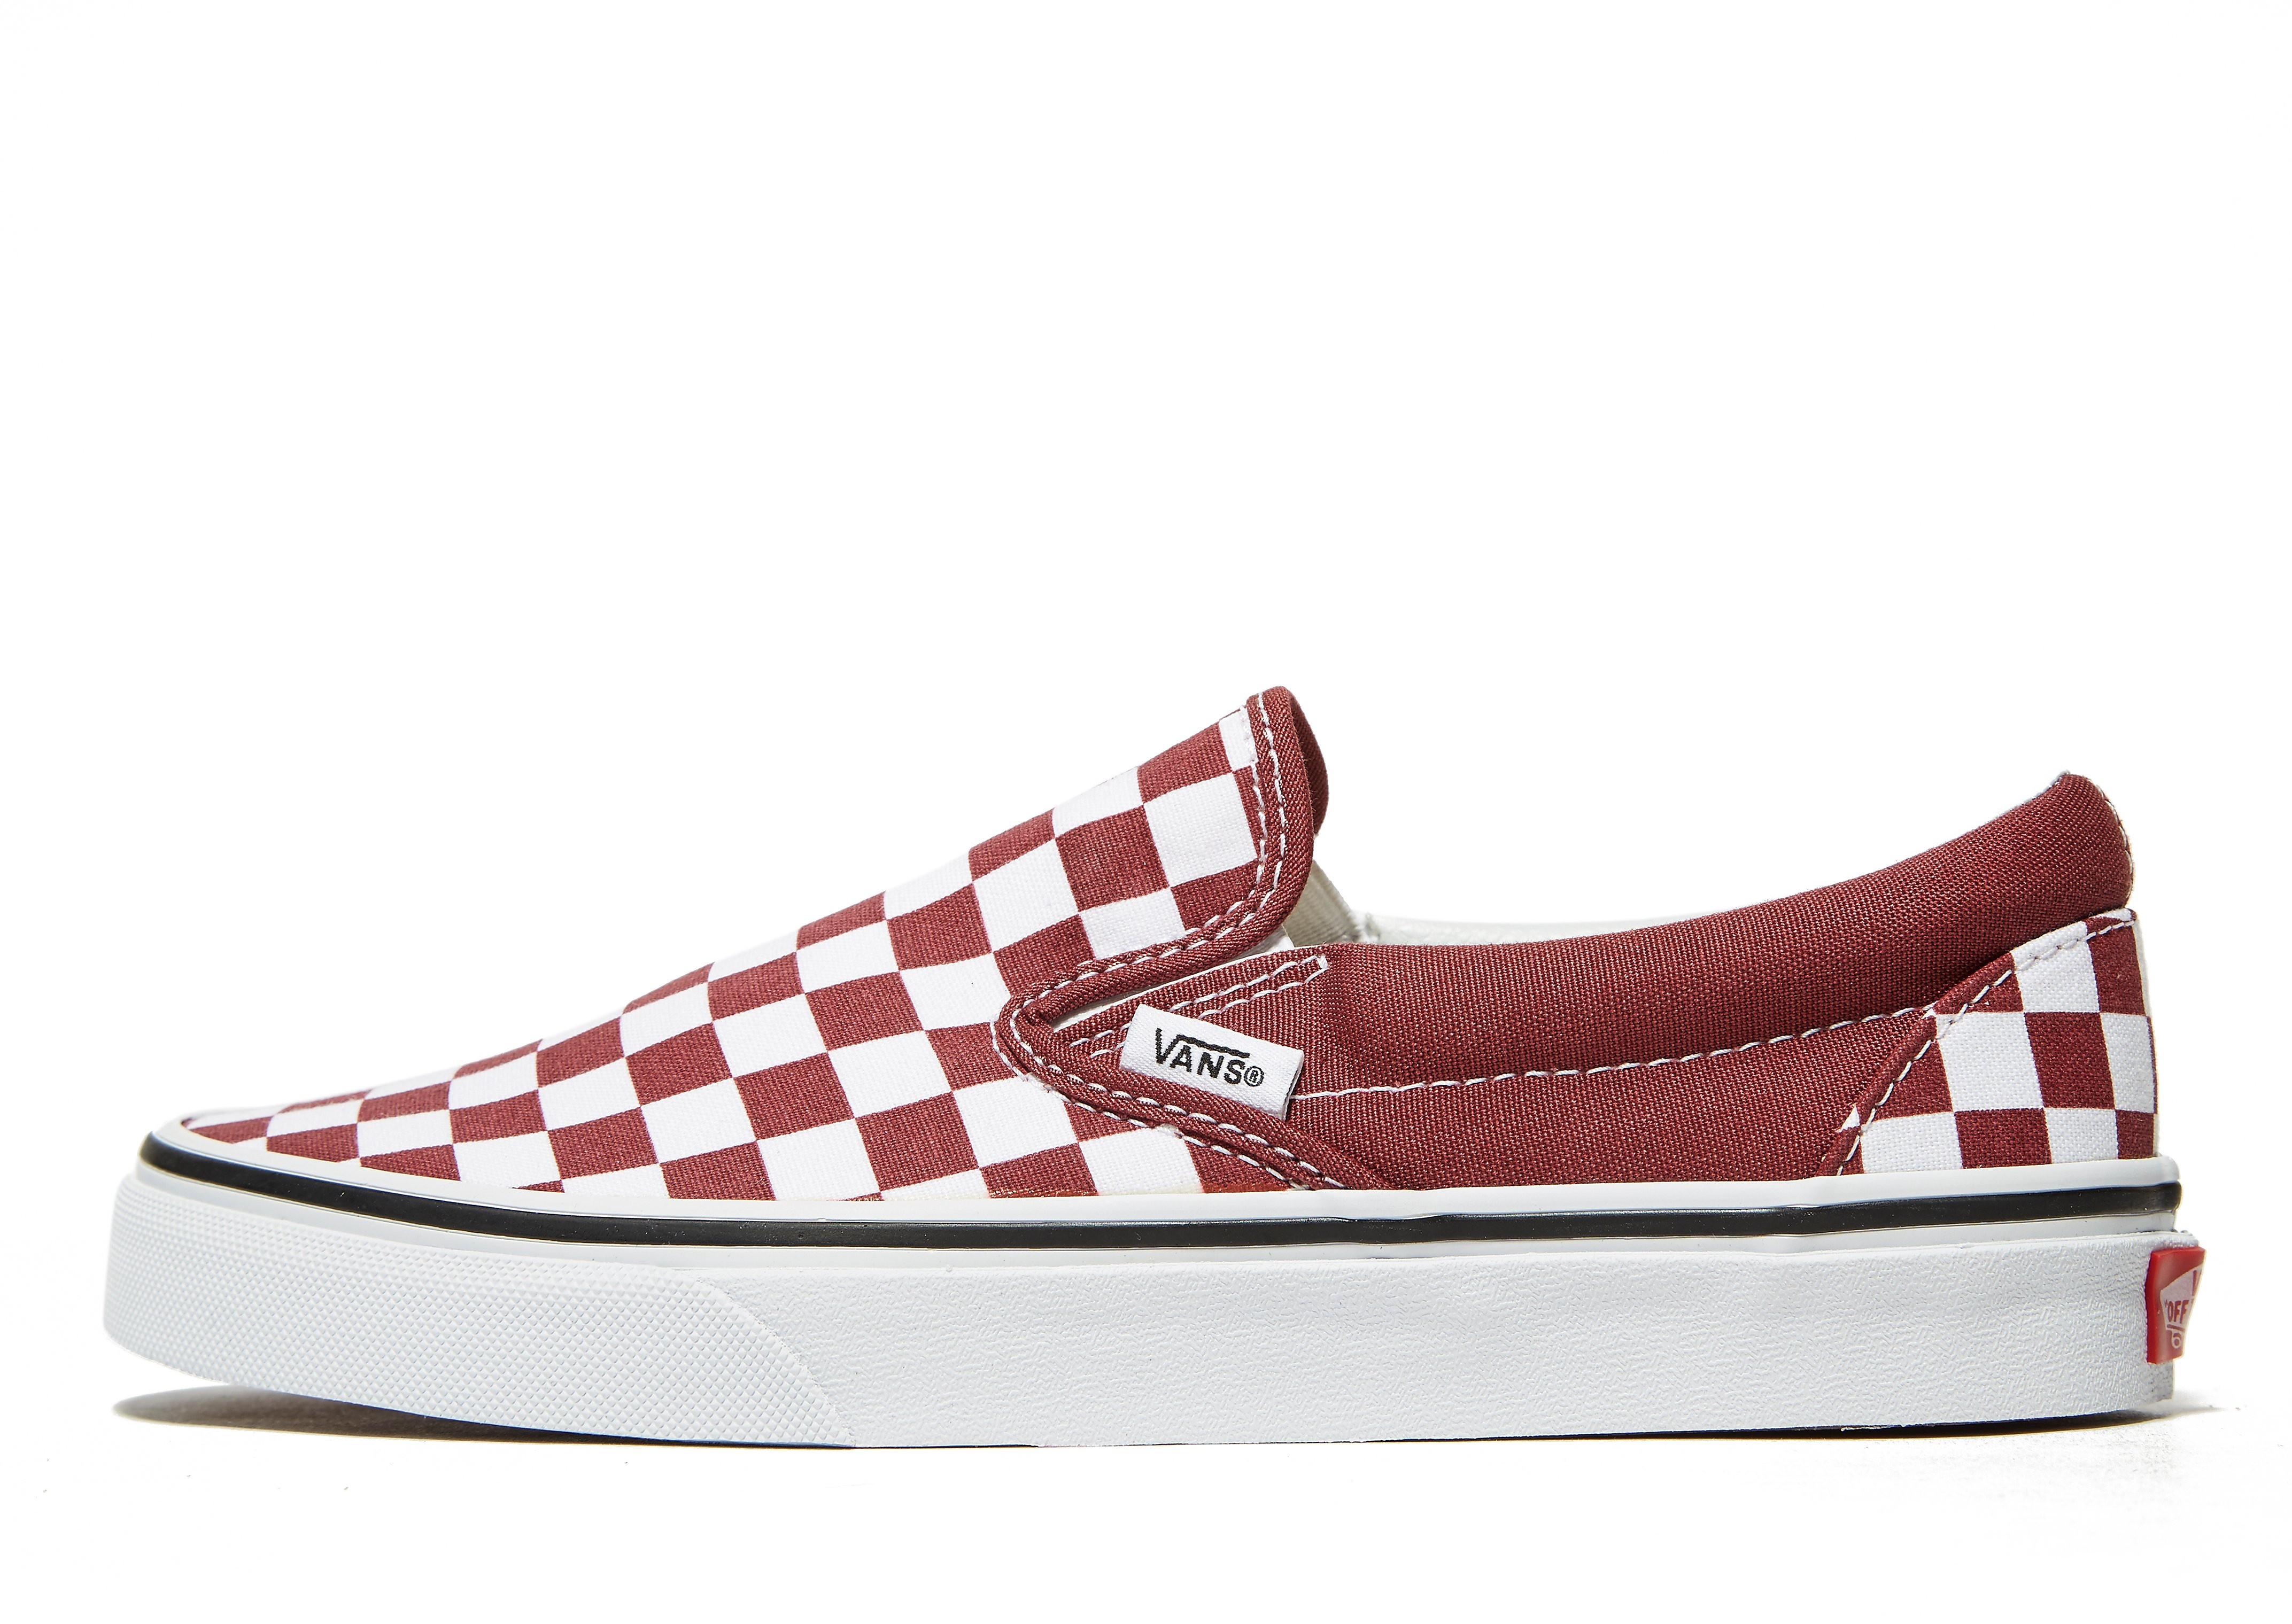 Vans Classic Slip On Damen Rot-Weiß